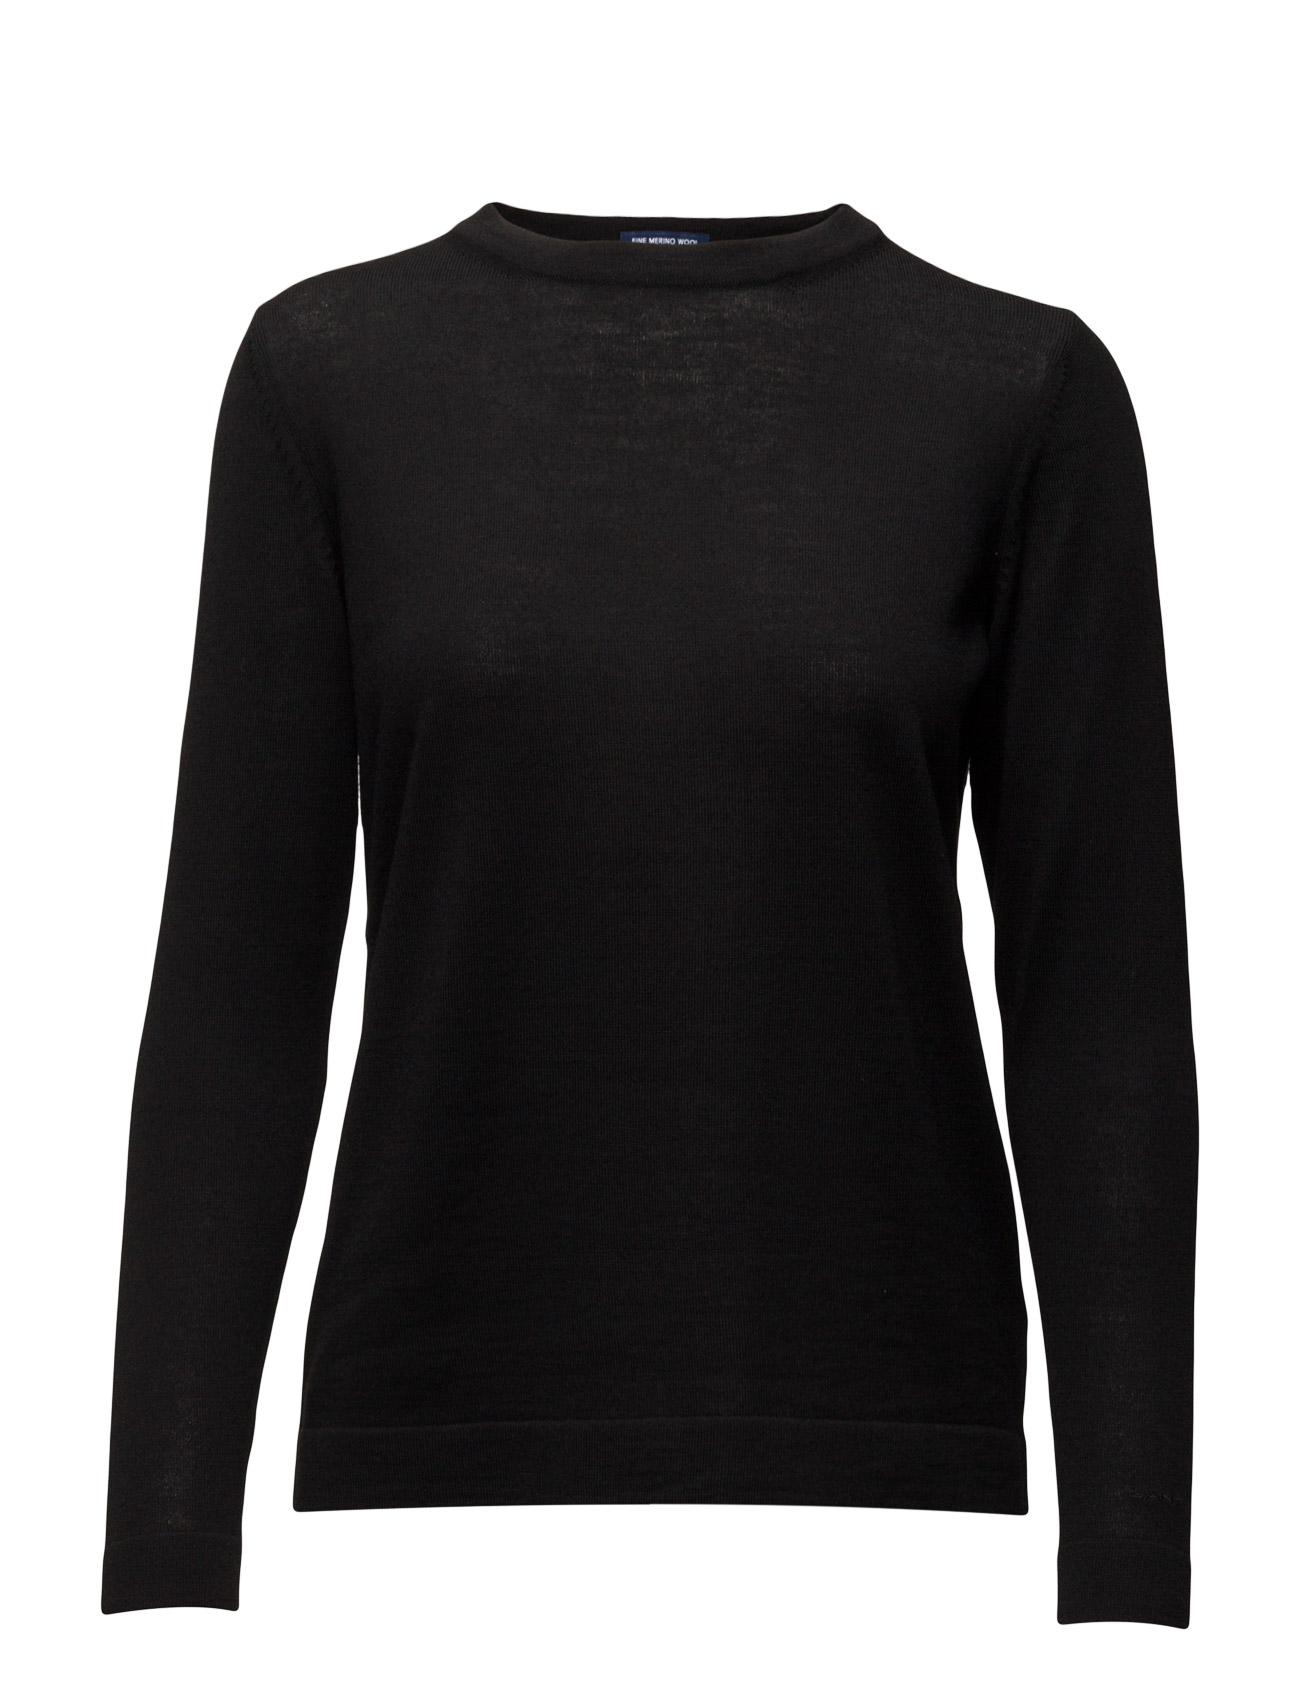 Fine Merino Wool Crew GANT Sweatshirts til Damer i Sort